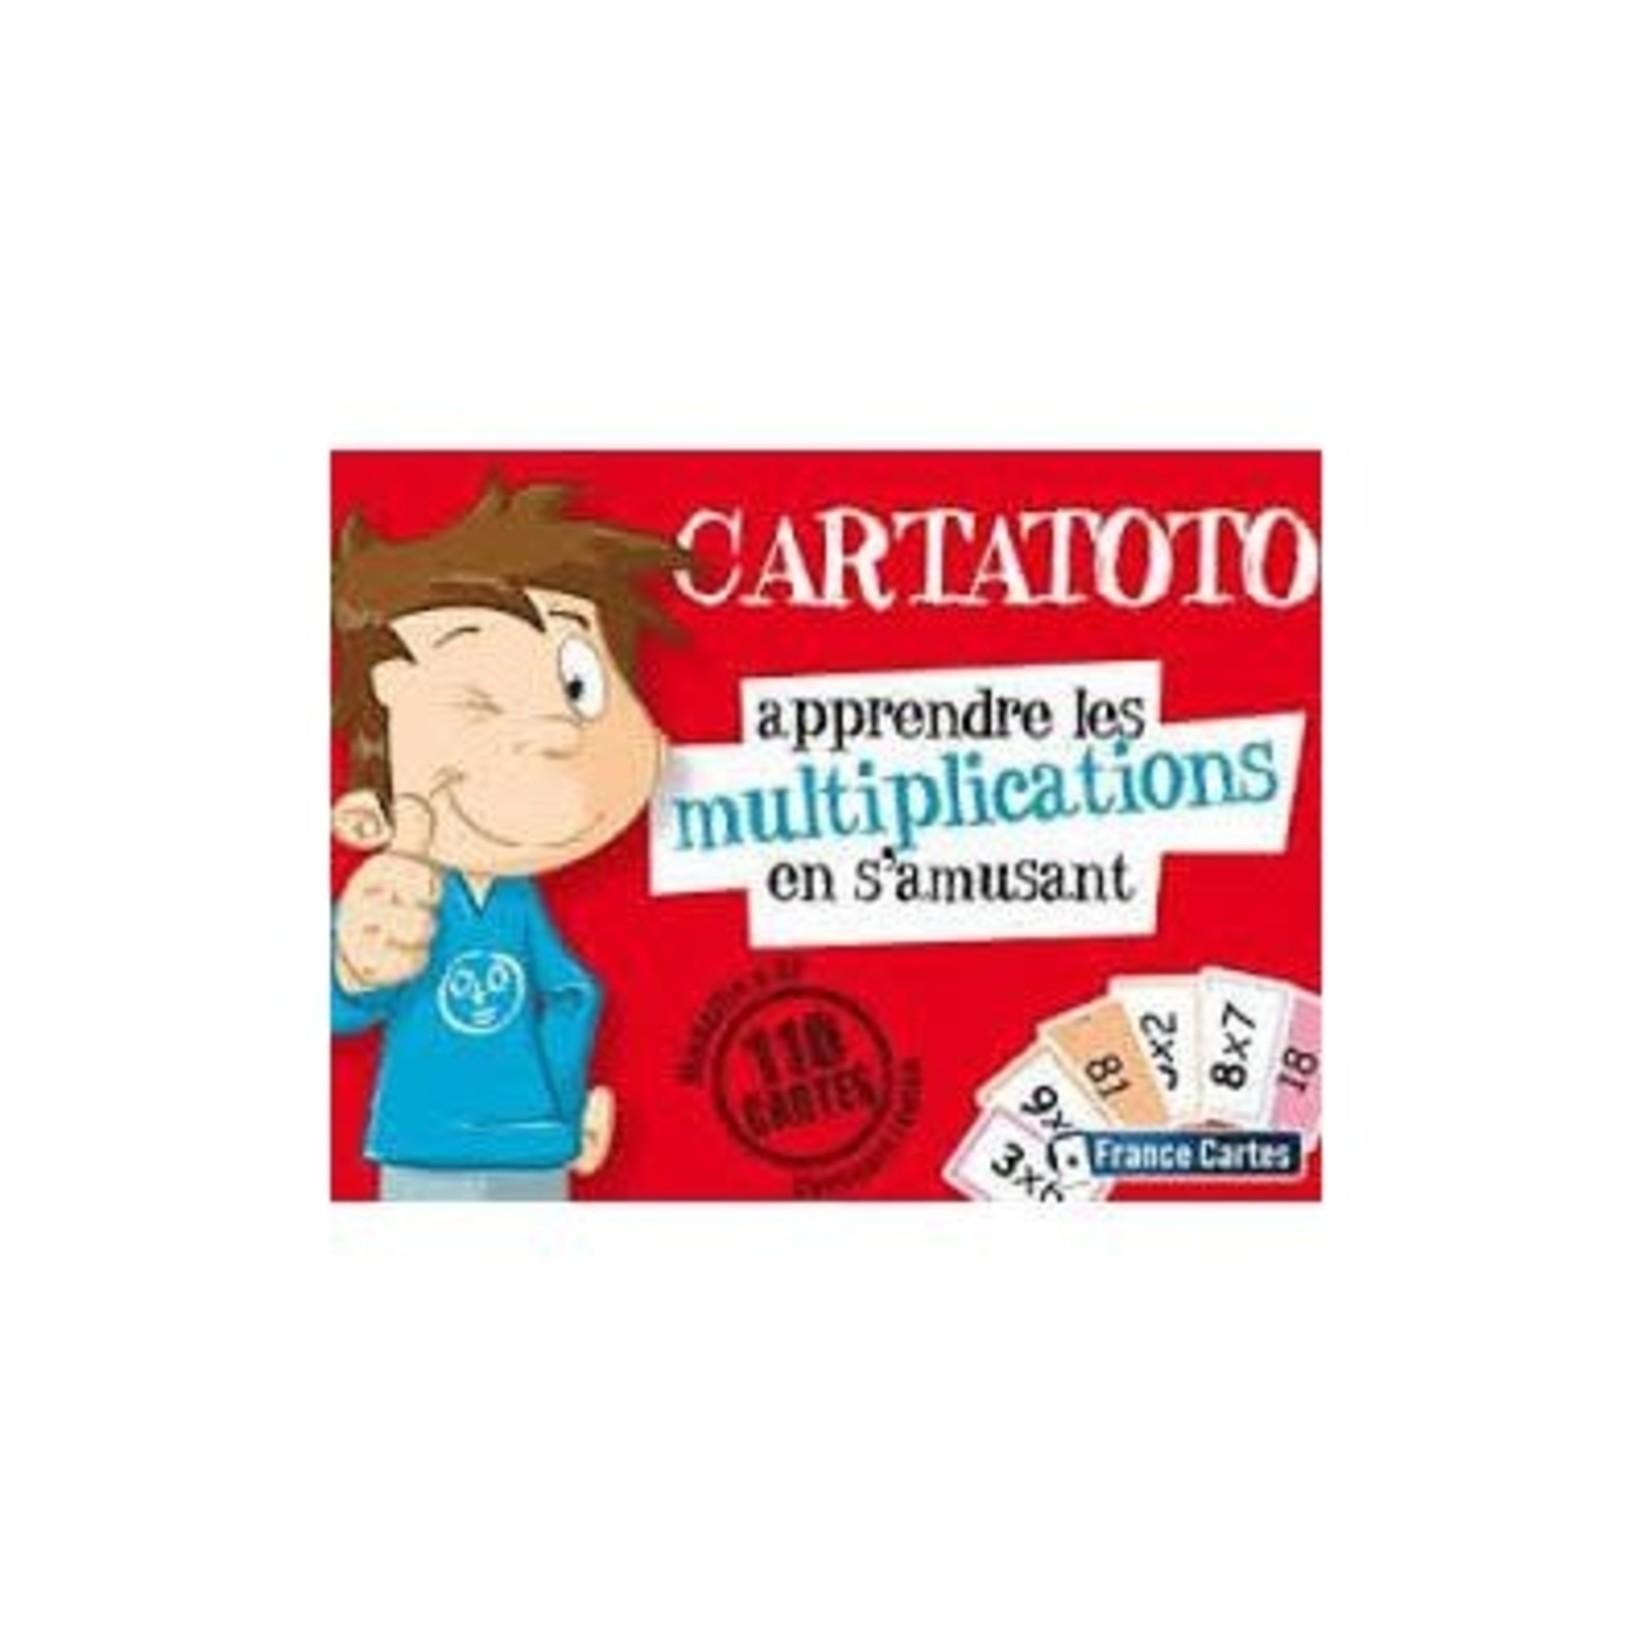 France Cartes Cartatoto Multiplications (FR)